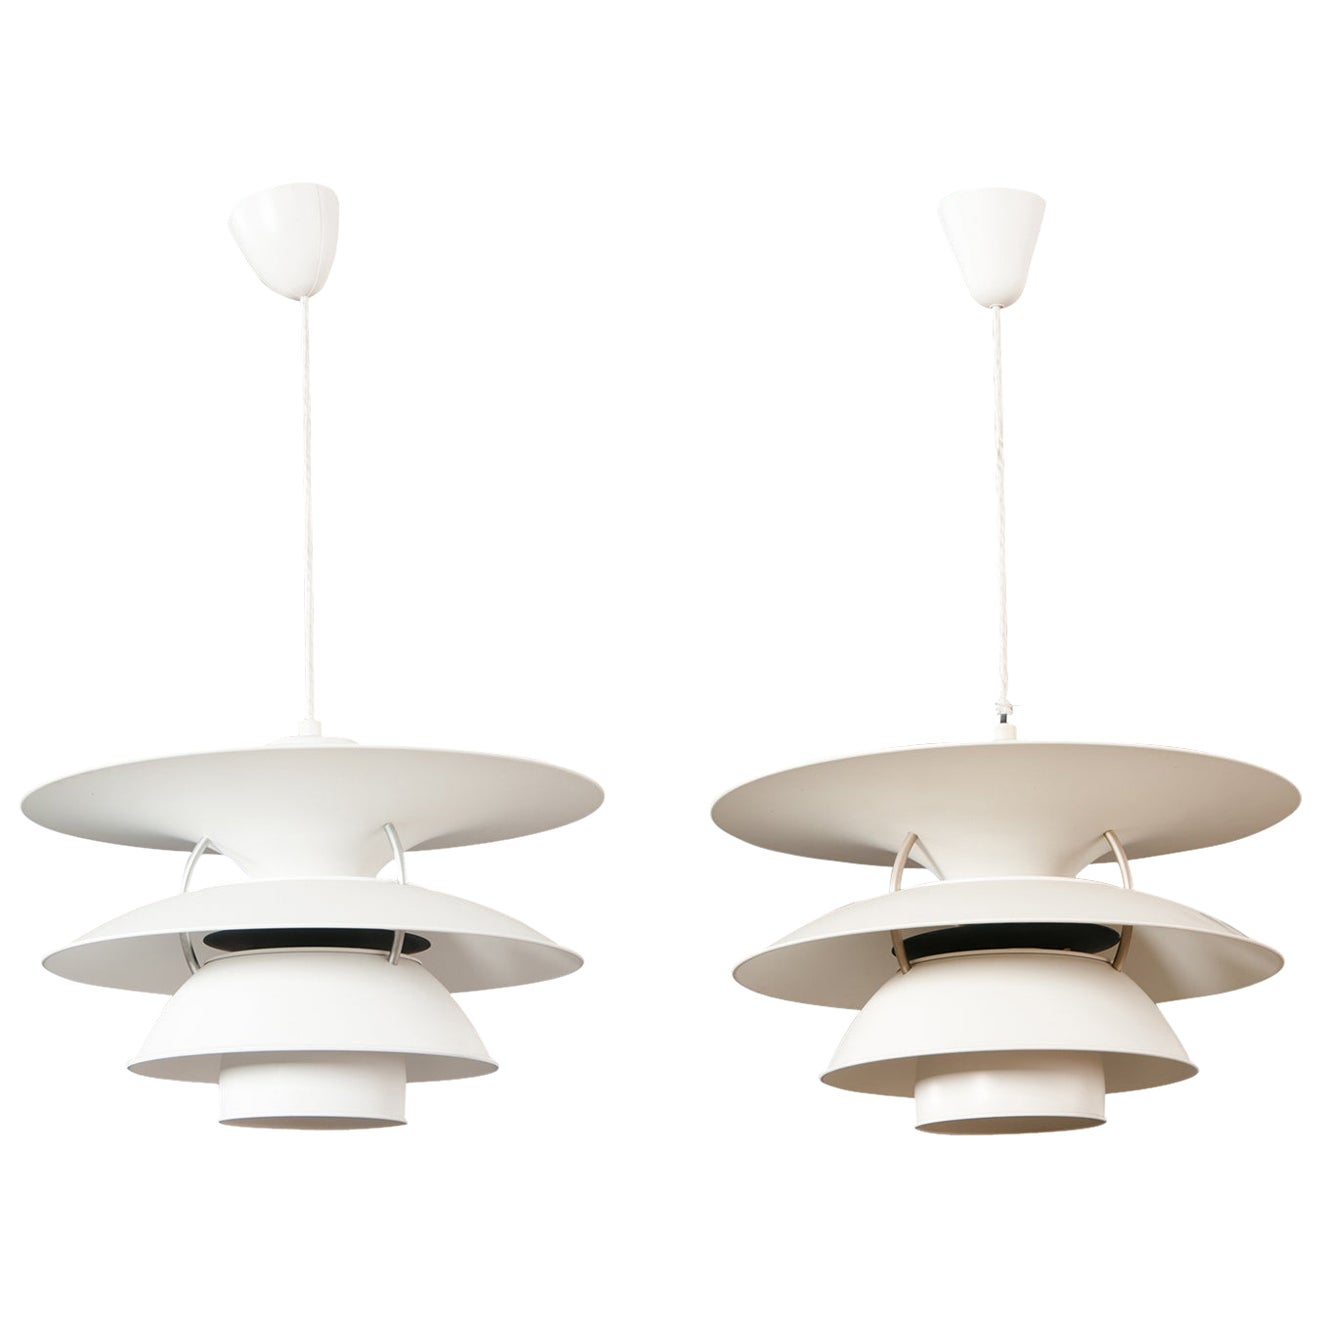 Pair of Vintage PH 6.5-6 White Charlottenborg Ceiling Lamps for Louis Poulsen